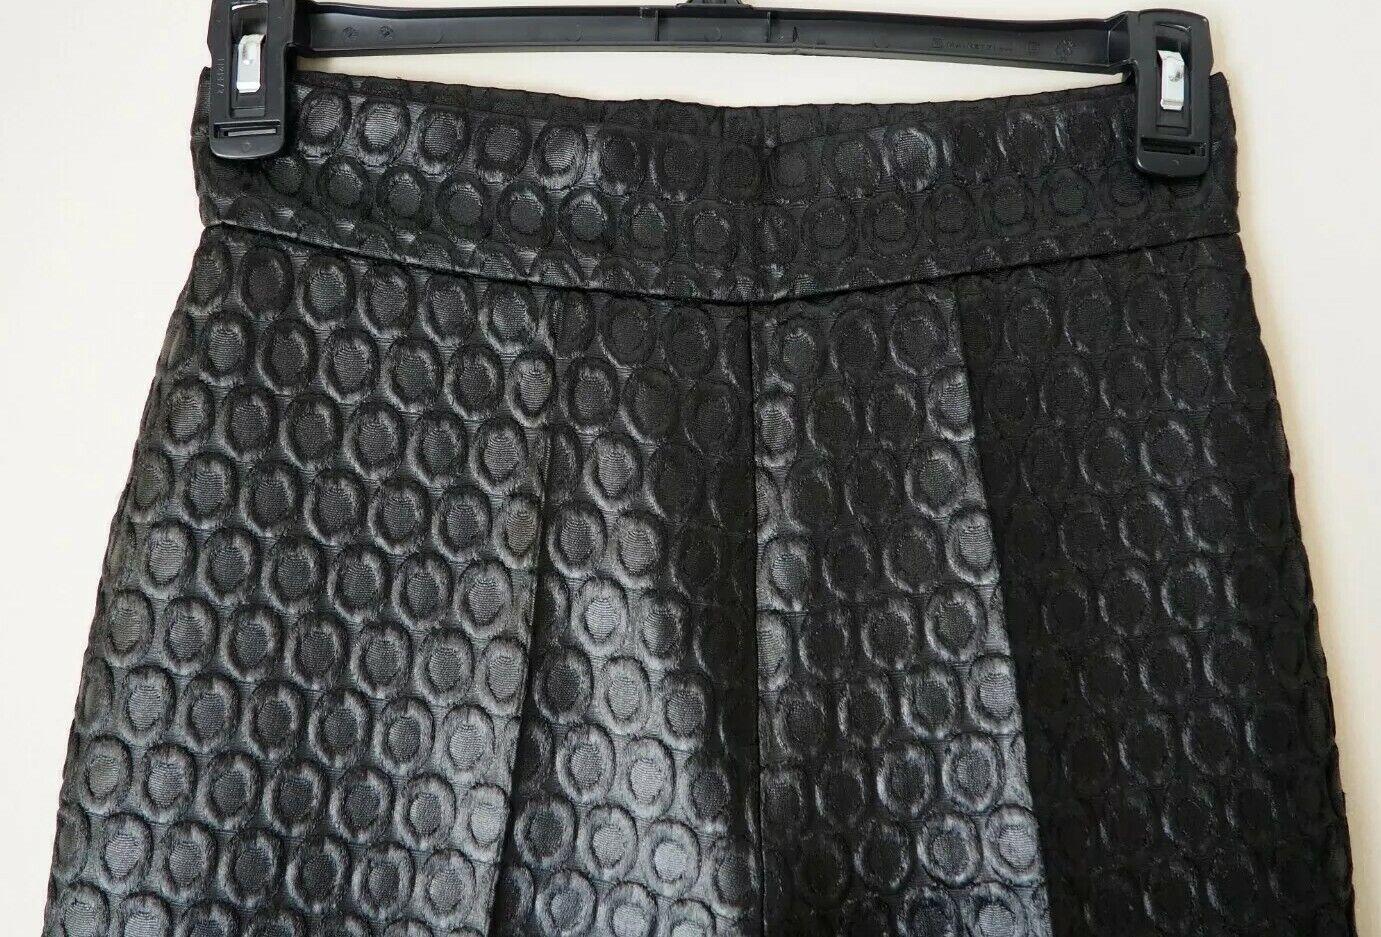 PRADA 1990's Vintage Pants Trousers Circular Desi… - image 4